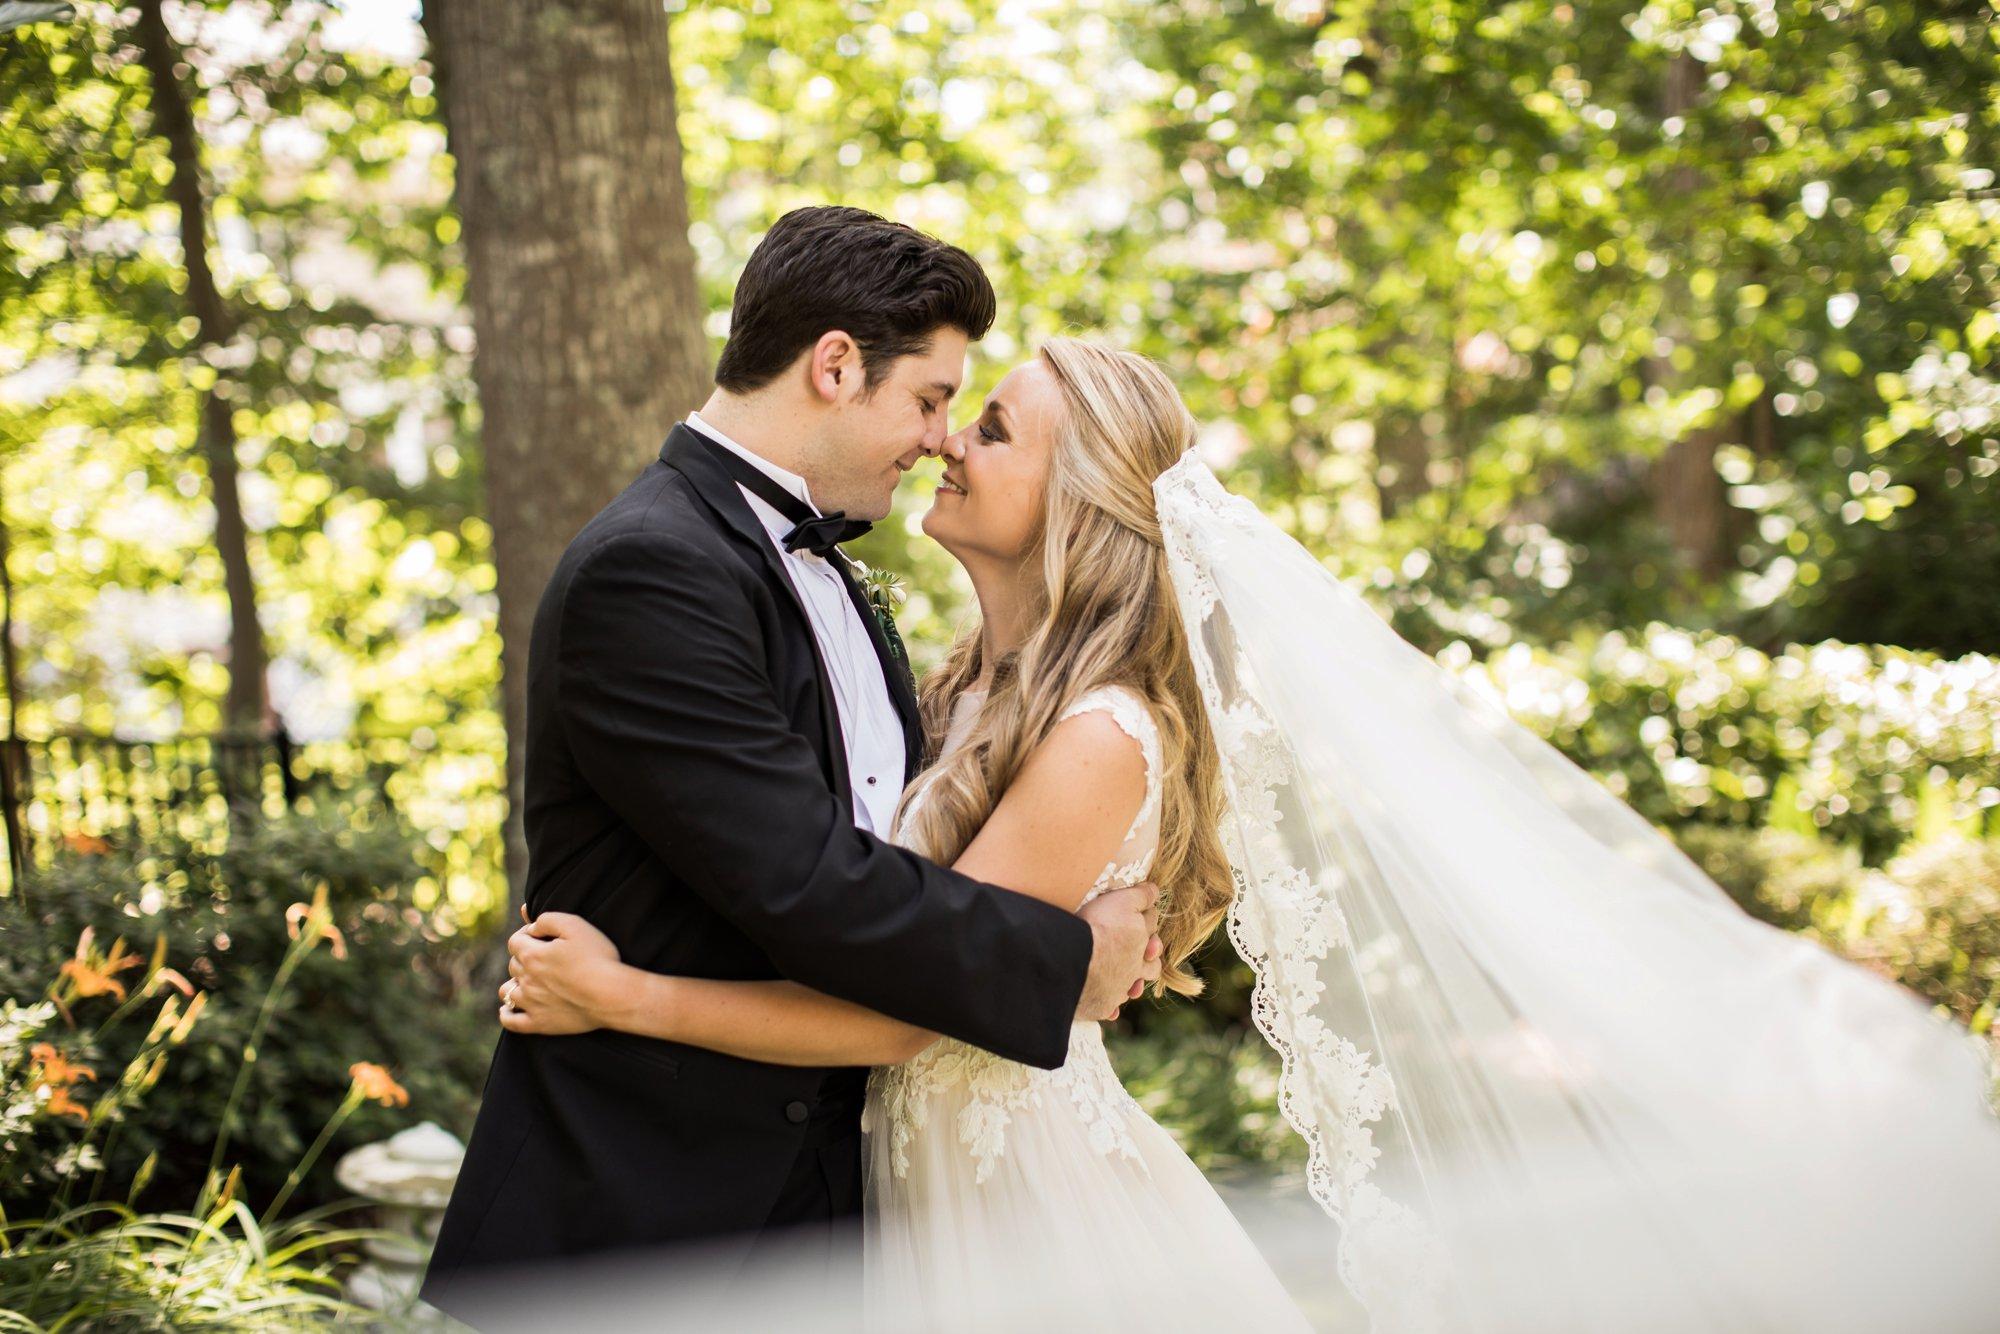 wedding-photography-88-love-stories_0012.jpg